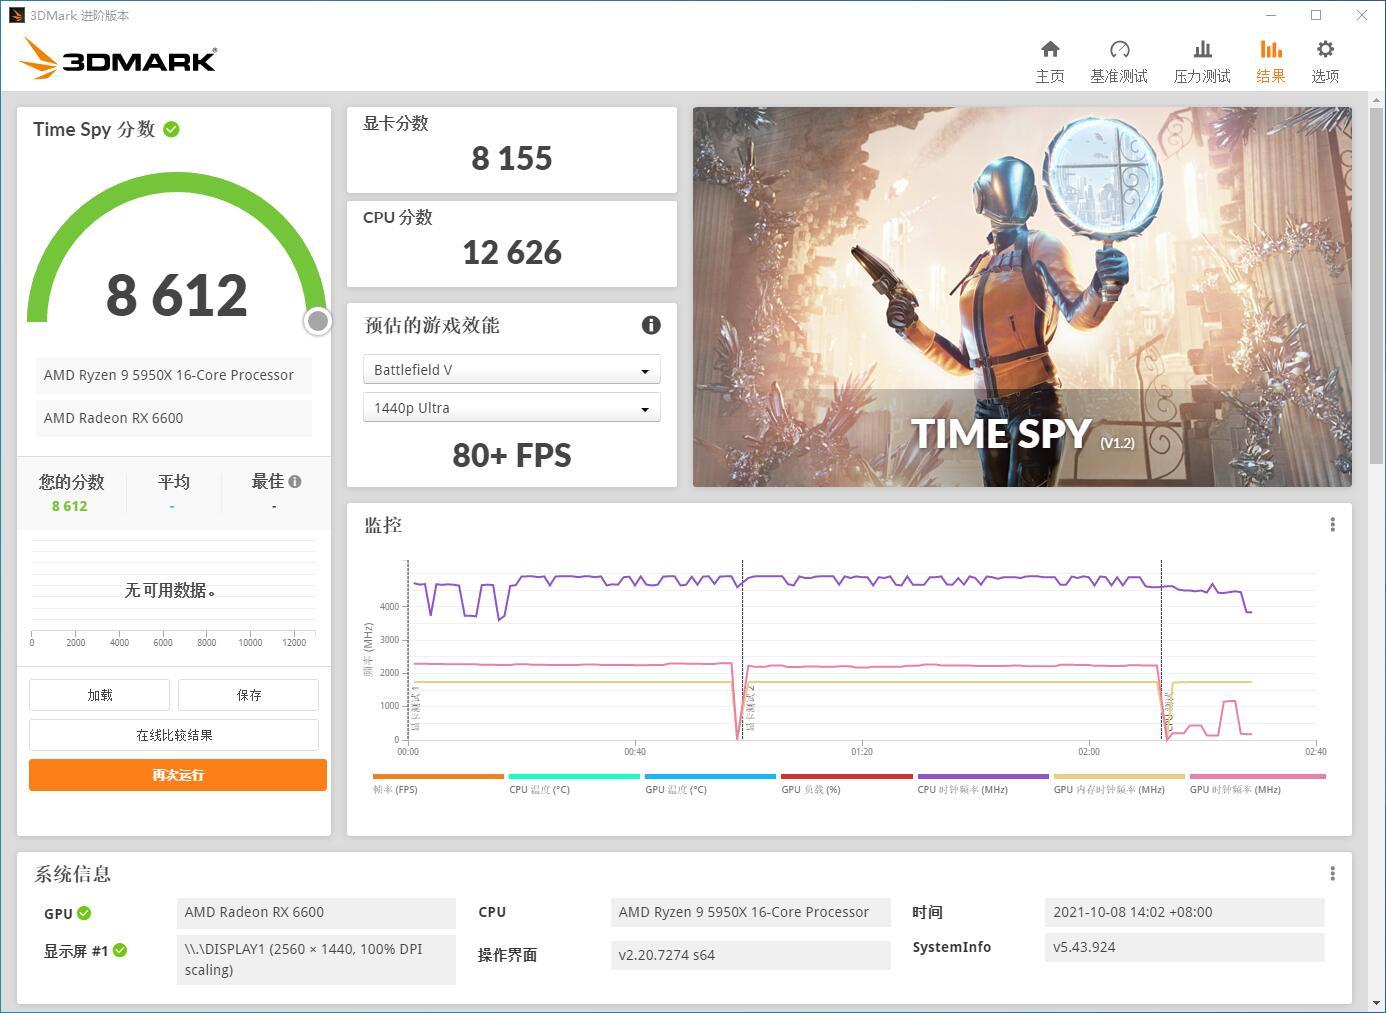 Видеокарта Radeon RX 6600 немного уступила GeForce RTX 3060 в бенчмарке 3DMark Time Spy